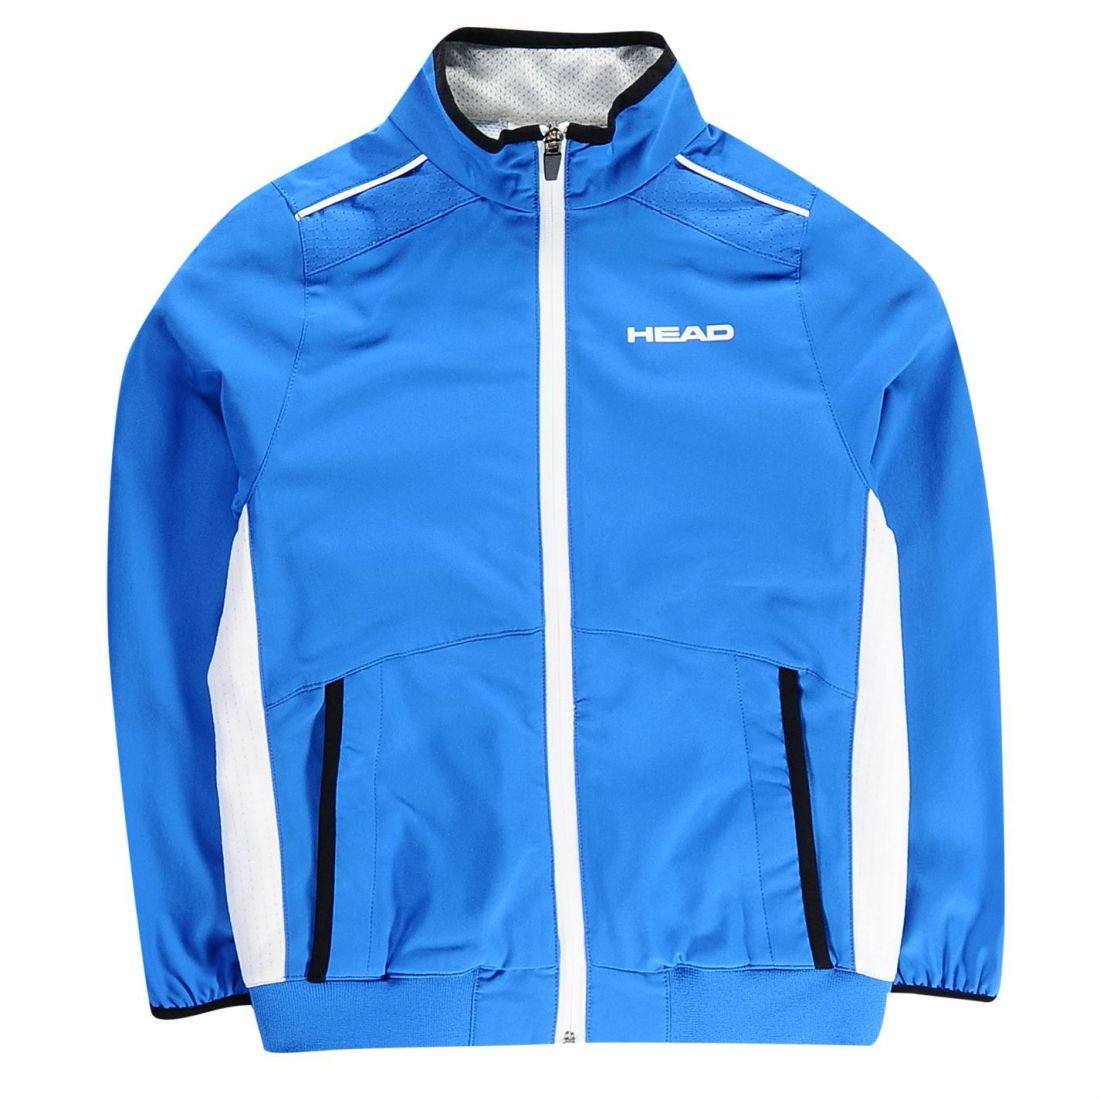 6ce978717 HEAD Kids Boys Club Jacket Performance Coat Top Long Sleeve ...